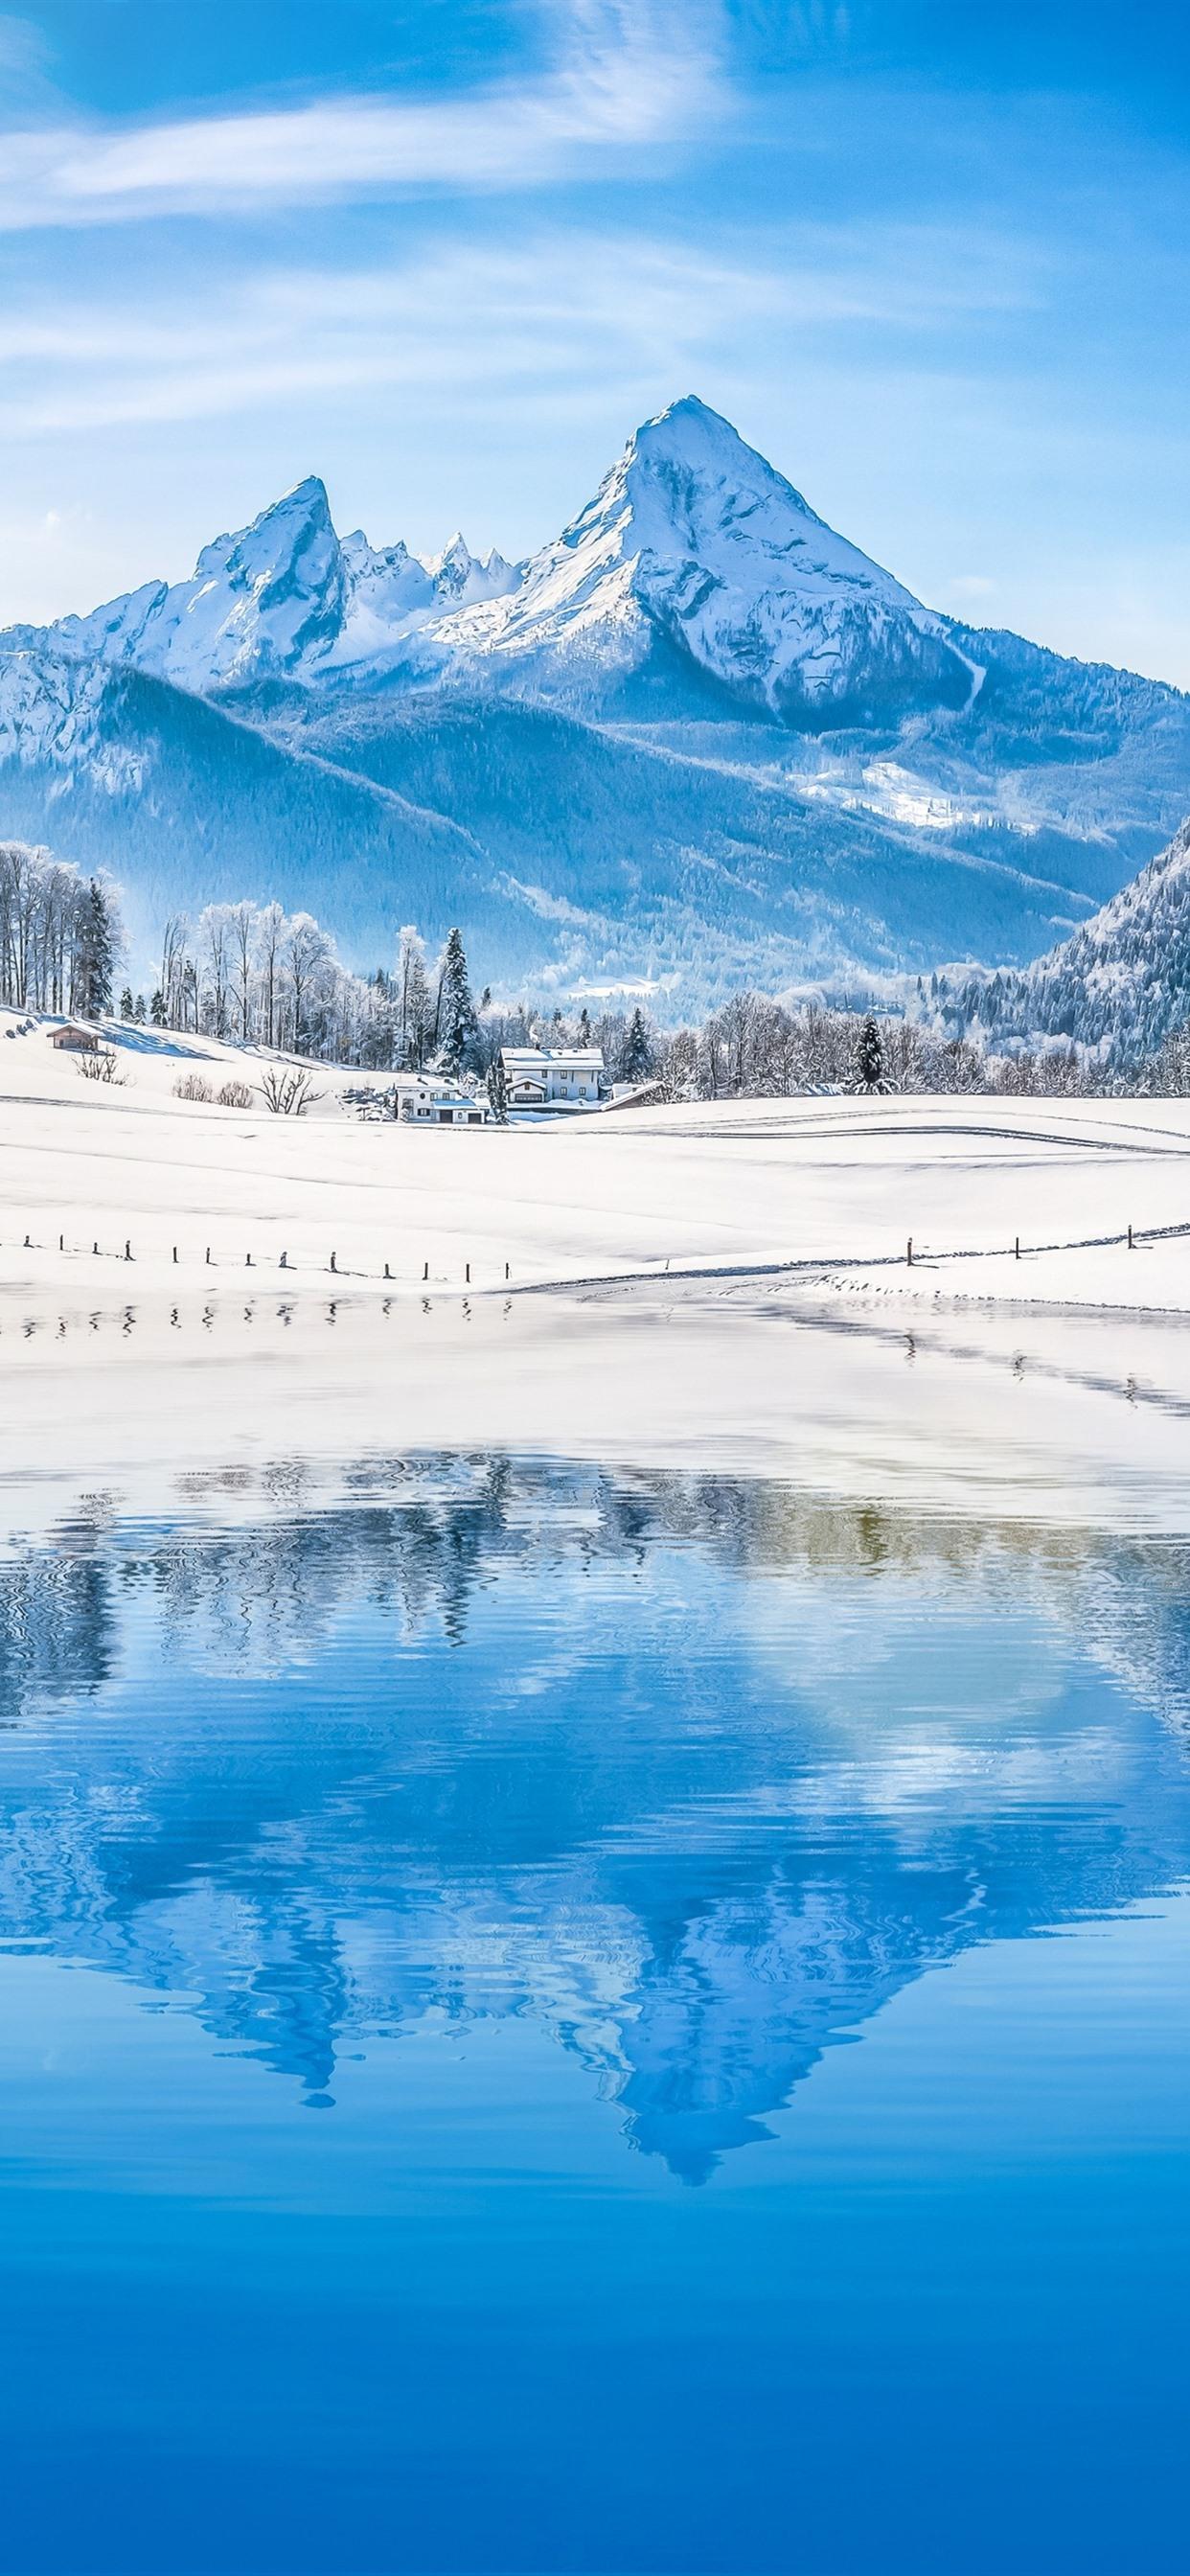 Mountains Trees Snow Lake Water Reflection Winter 1242x2688